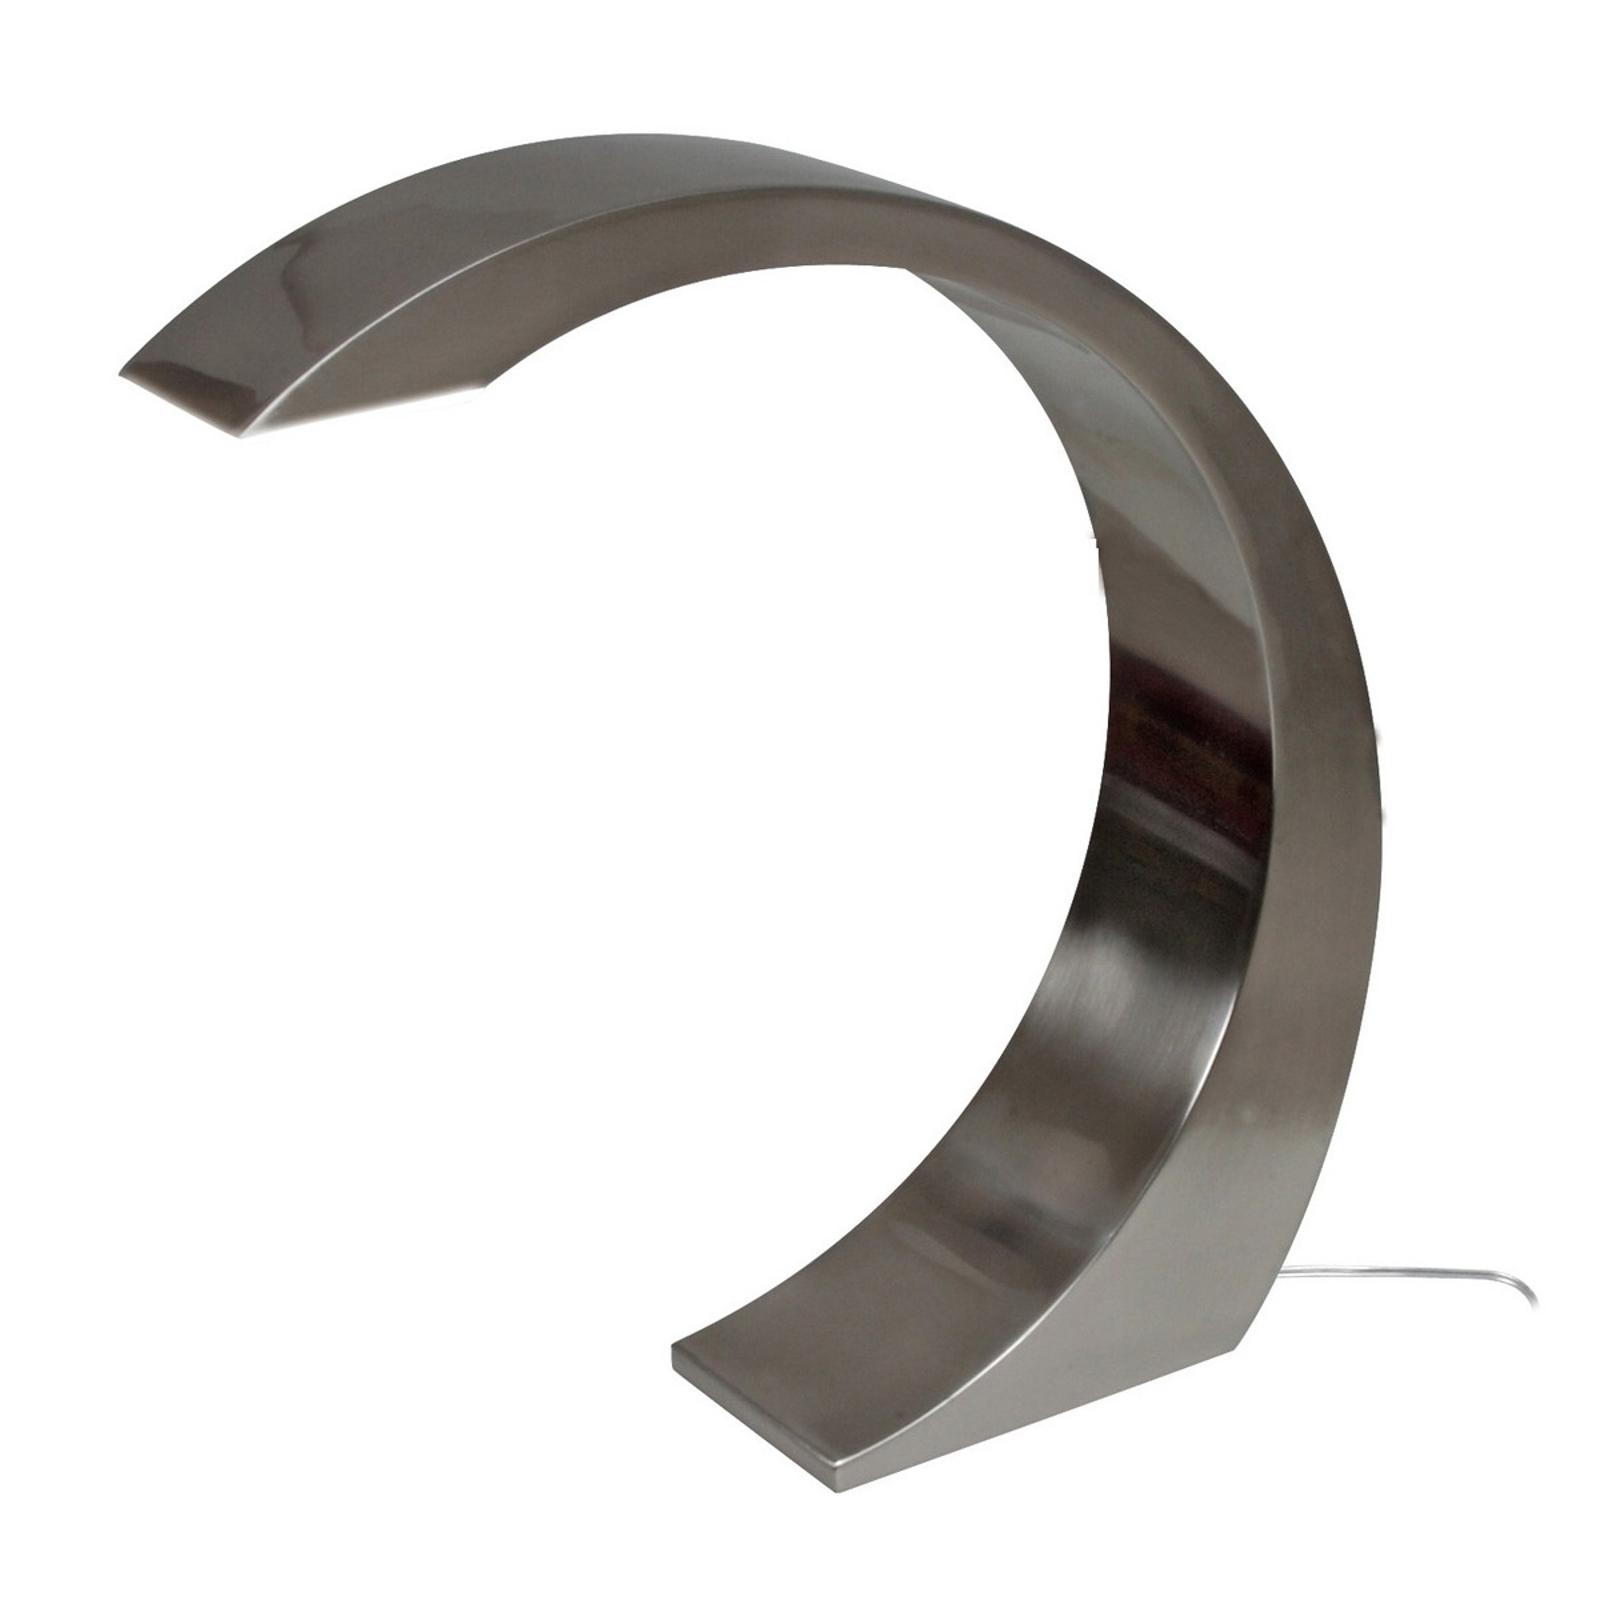 NAMI - nowoczesna lampa stołowa LED, 33 cm, szara